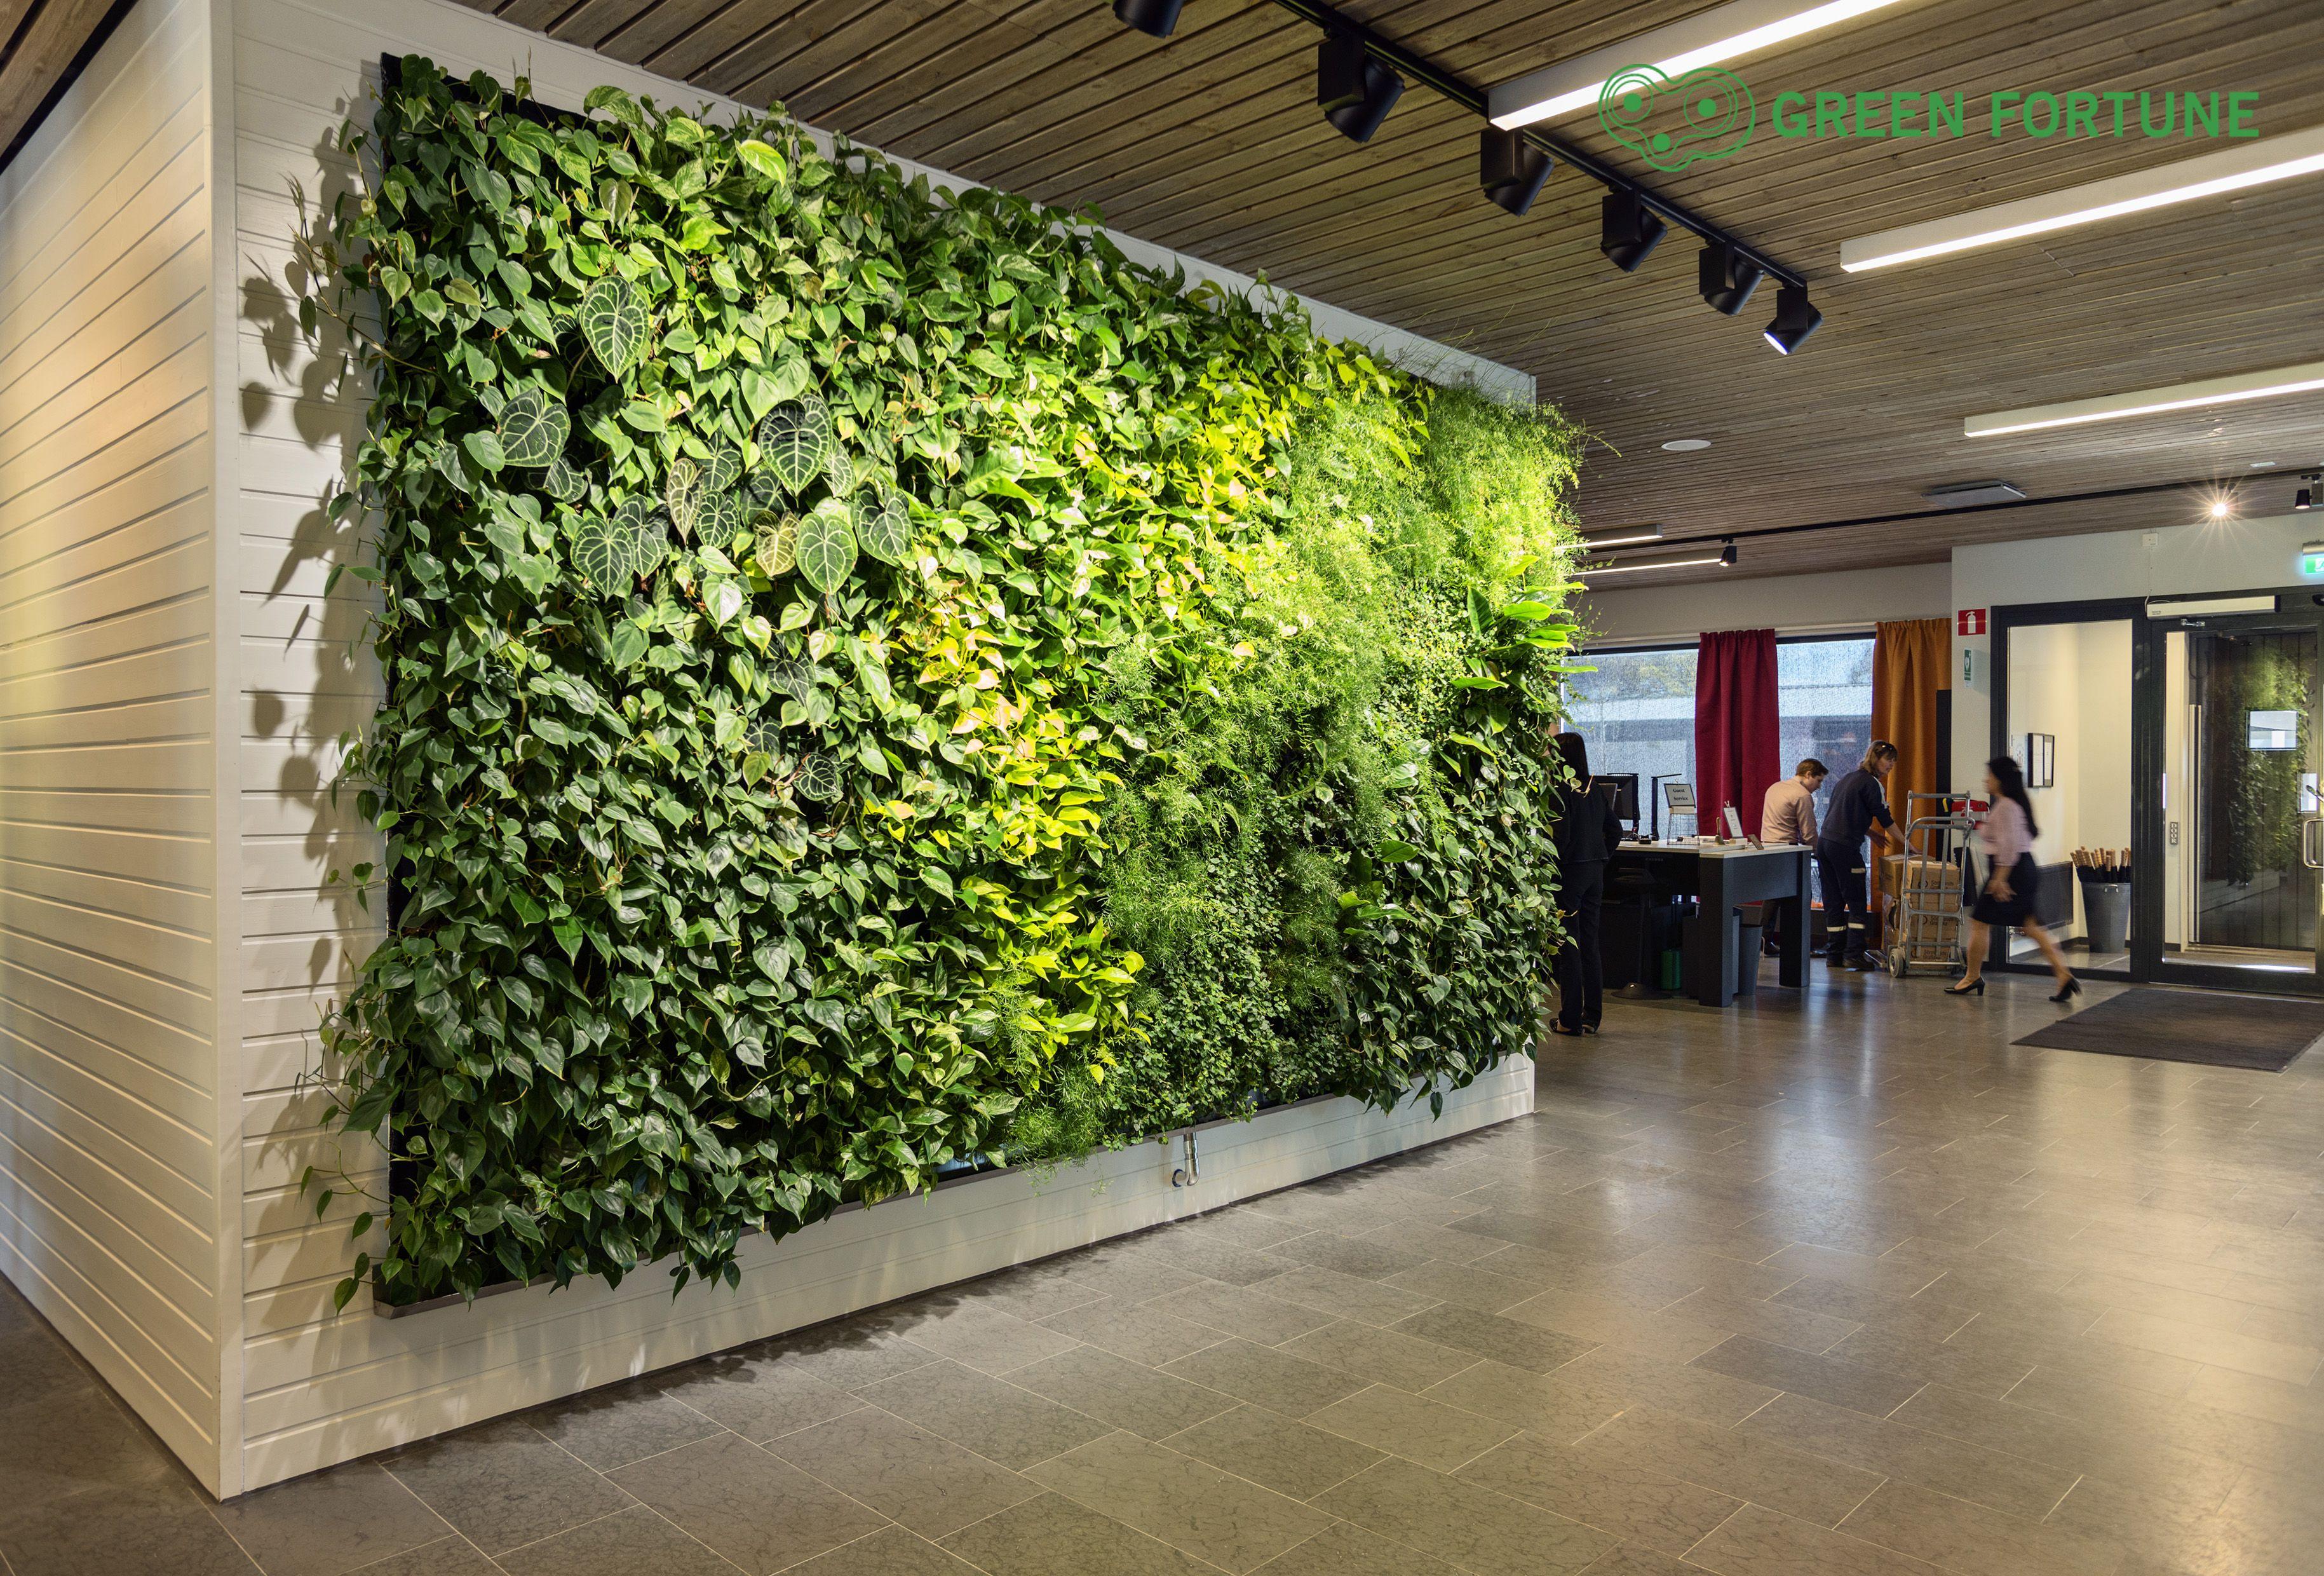 green fortune plantwall vertical garden office entrance. Black Bedroom Furniture Sets. Home Design Ideas